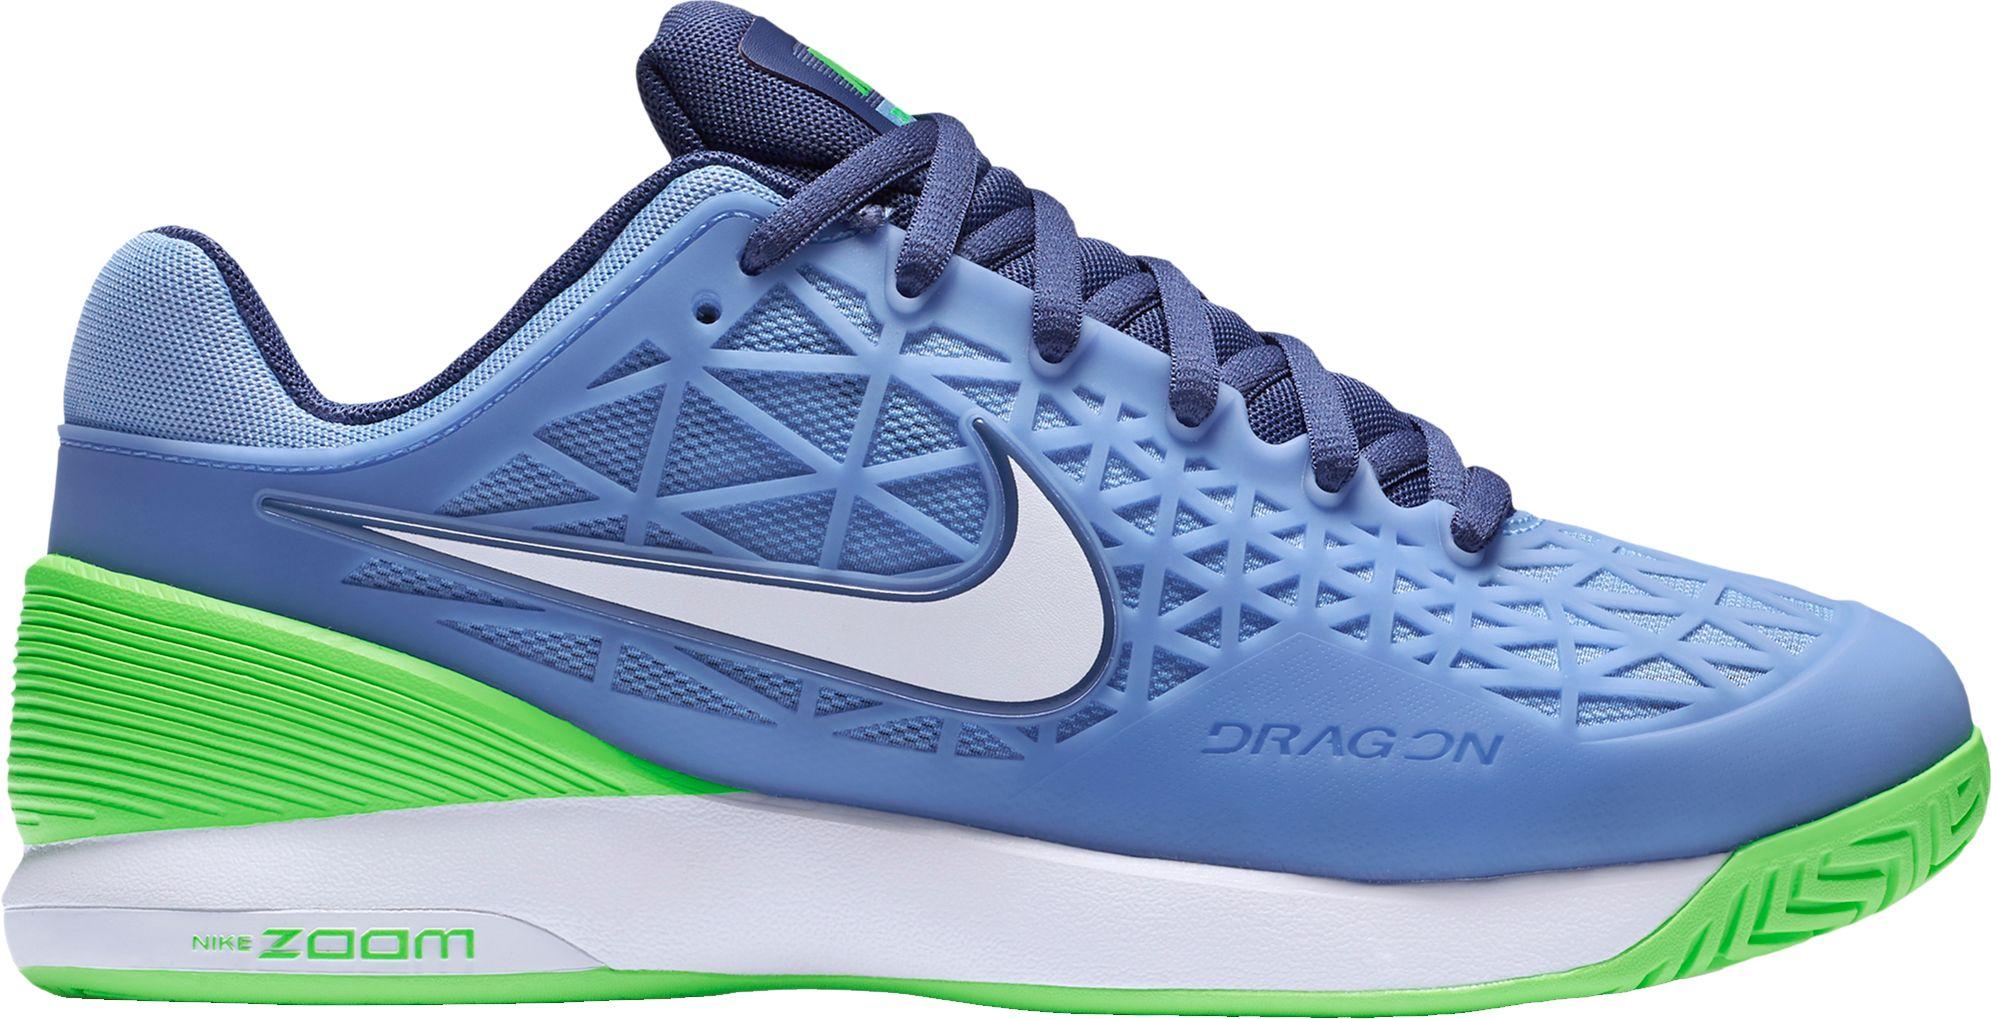 nike womenu0027s zoom cage 2 tennis shoes | dicku0027s sporting goods hiietrr